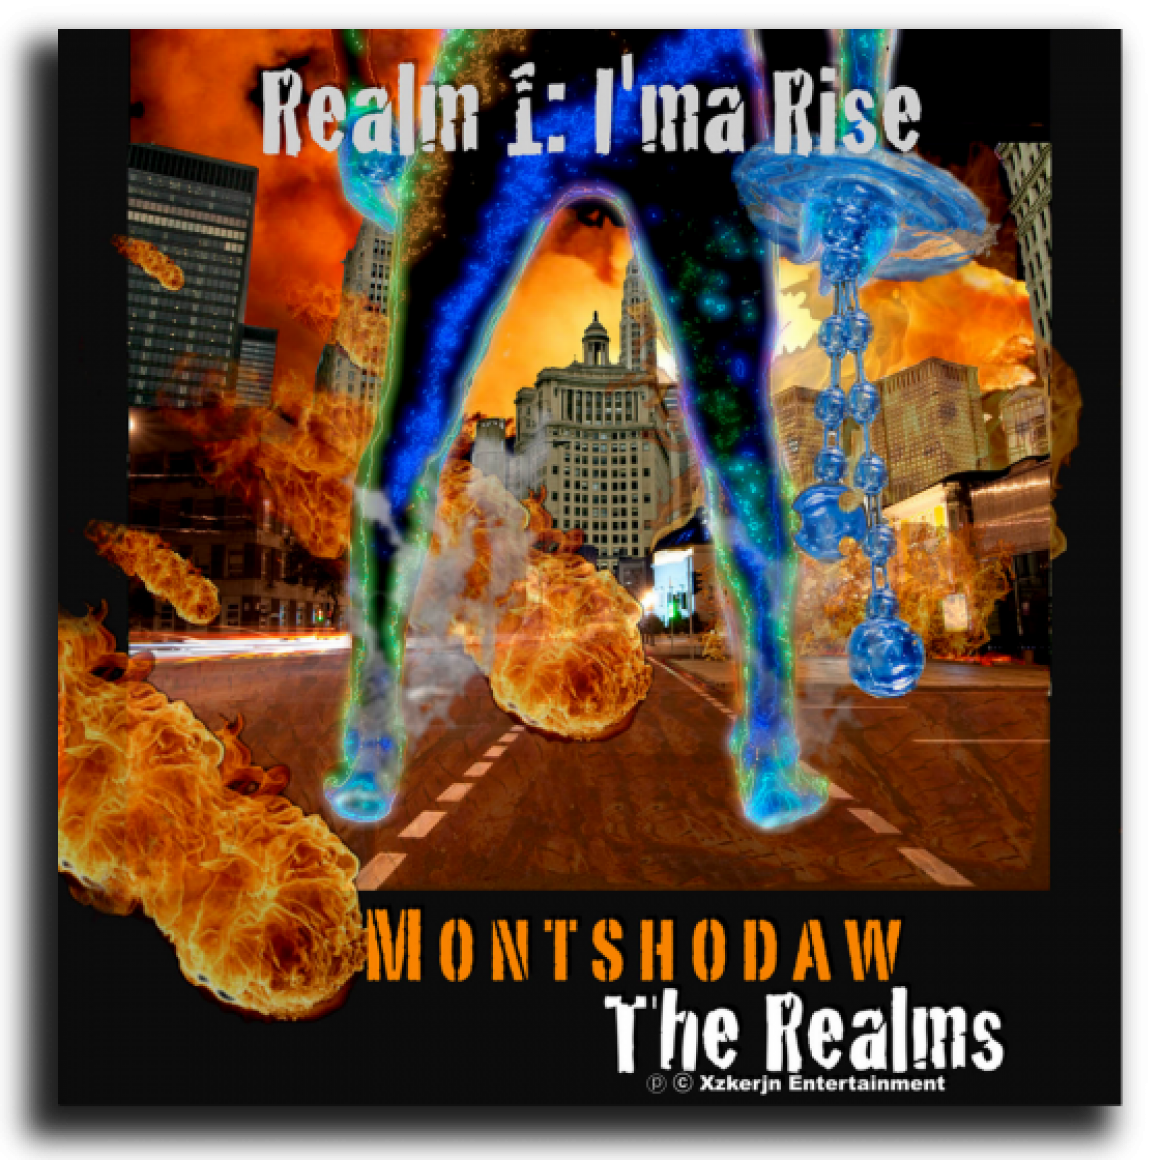 Montshodaw / The Realms... Realm 1: I'ma Rise (Digital Album)